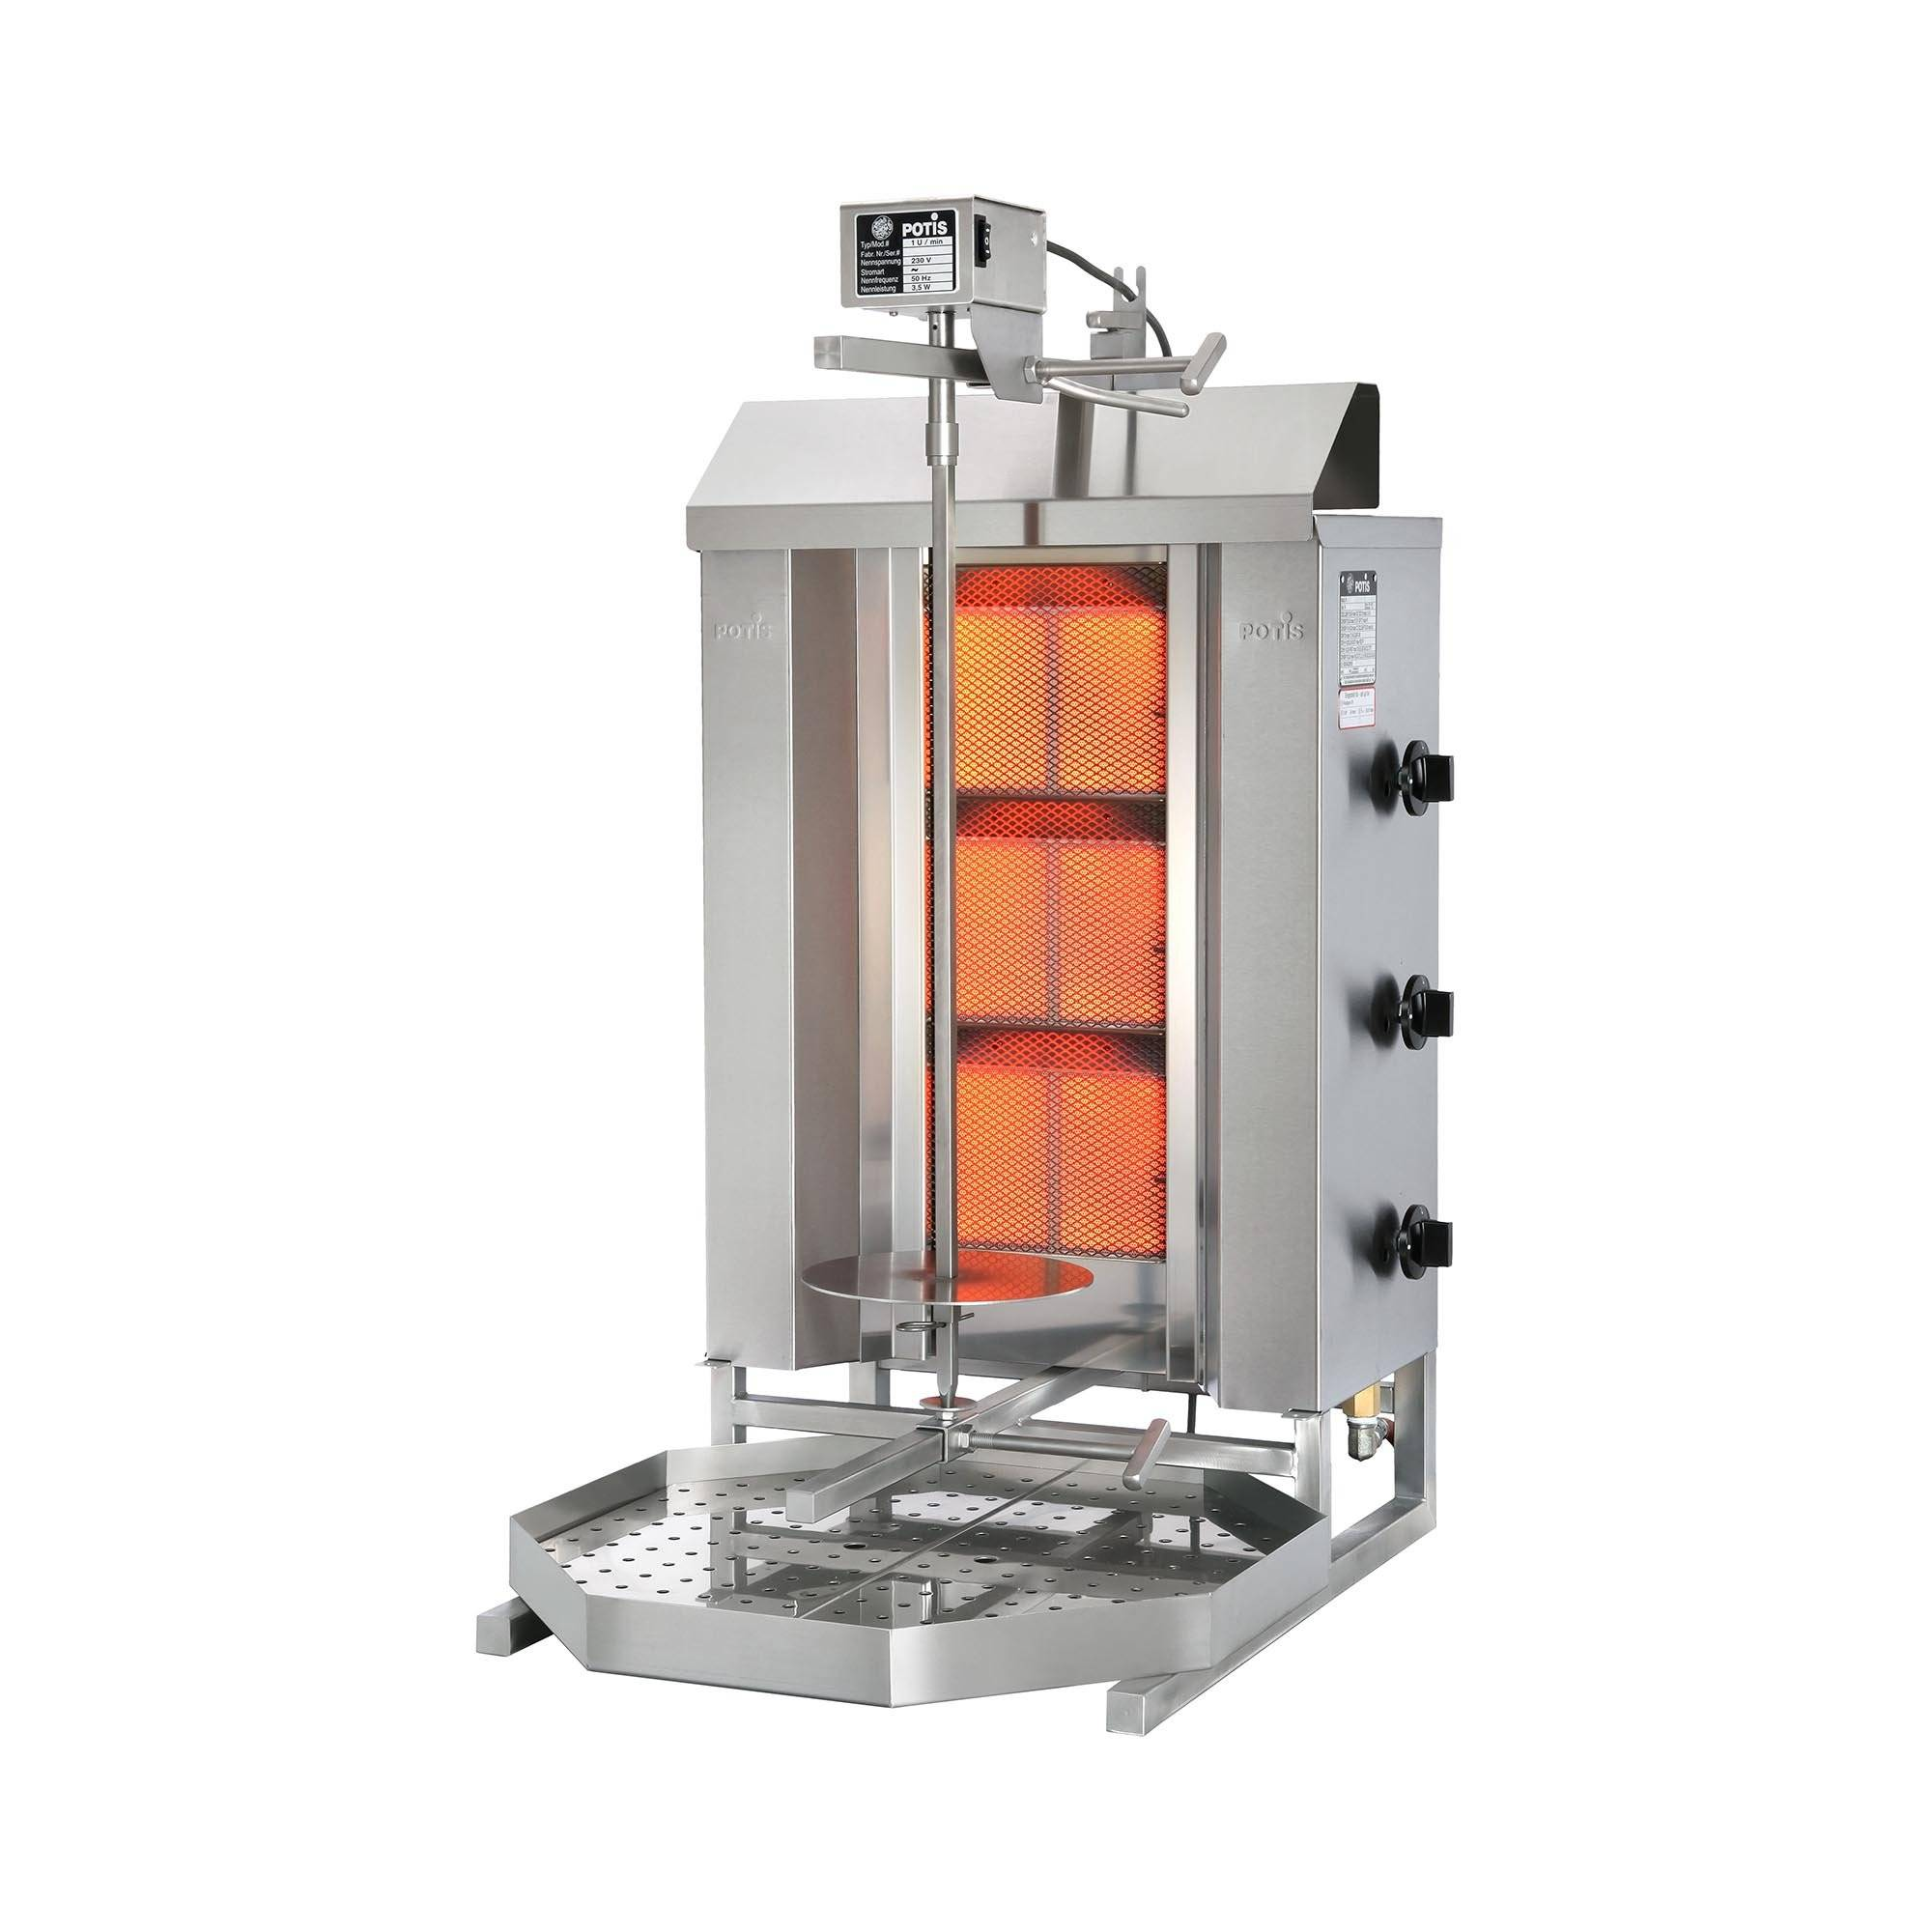 POTIS Dönergrill - 8.400 W - propan/butan GD3-S LPG